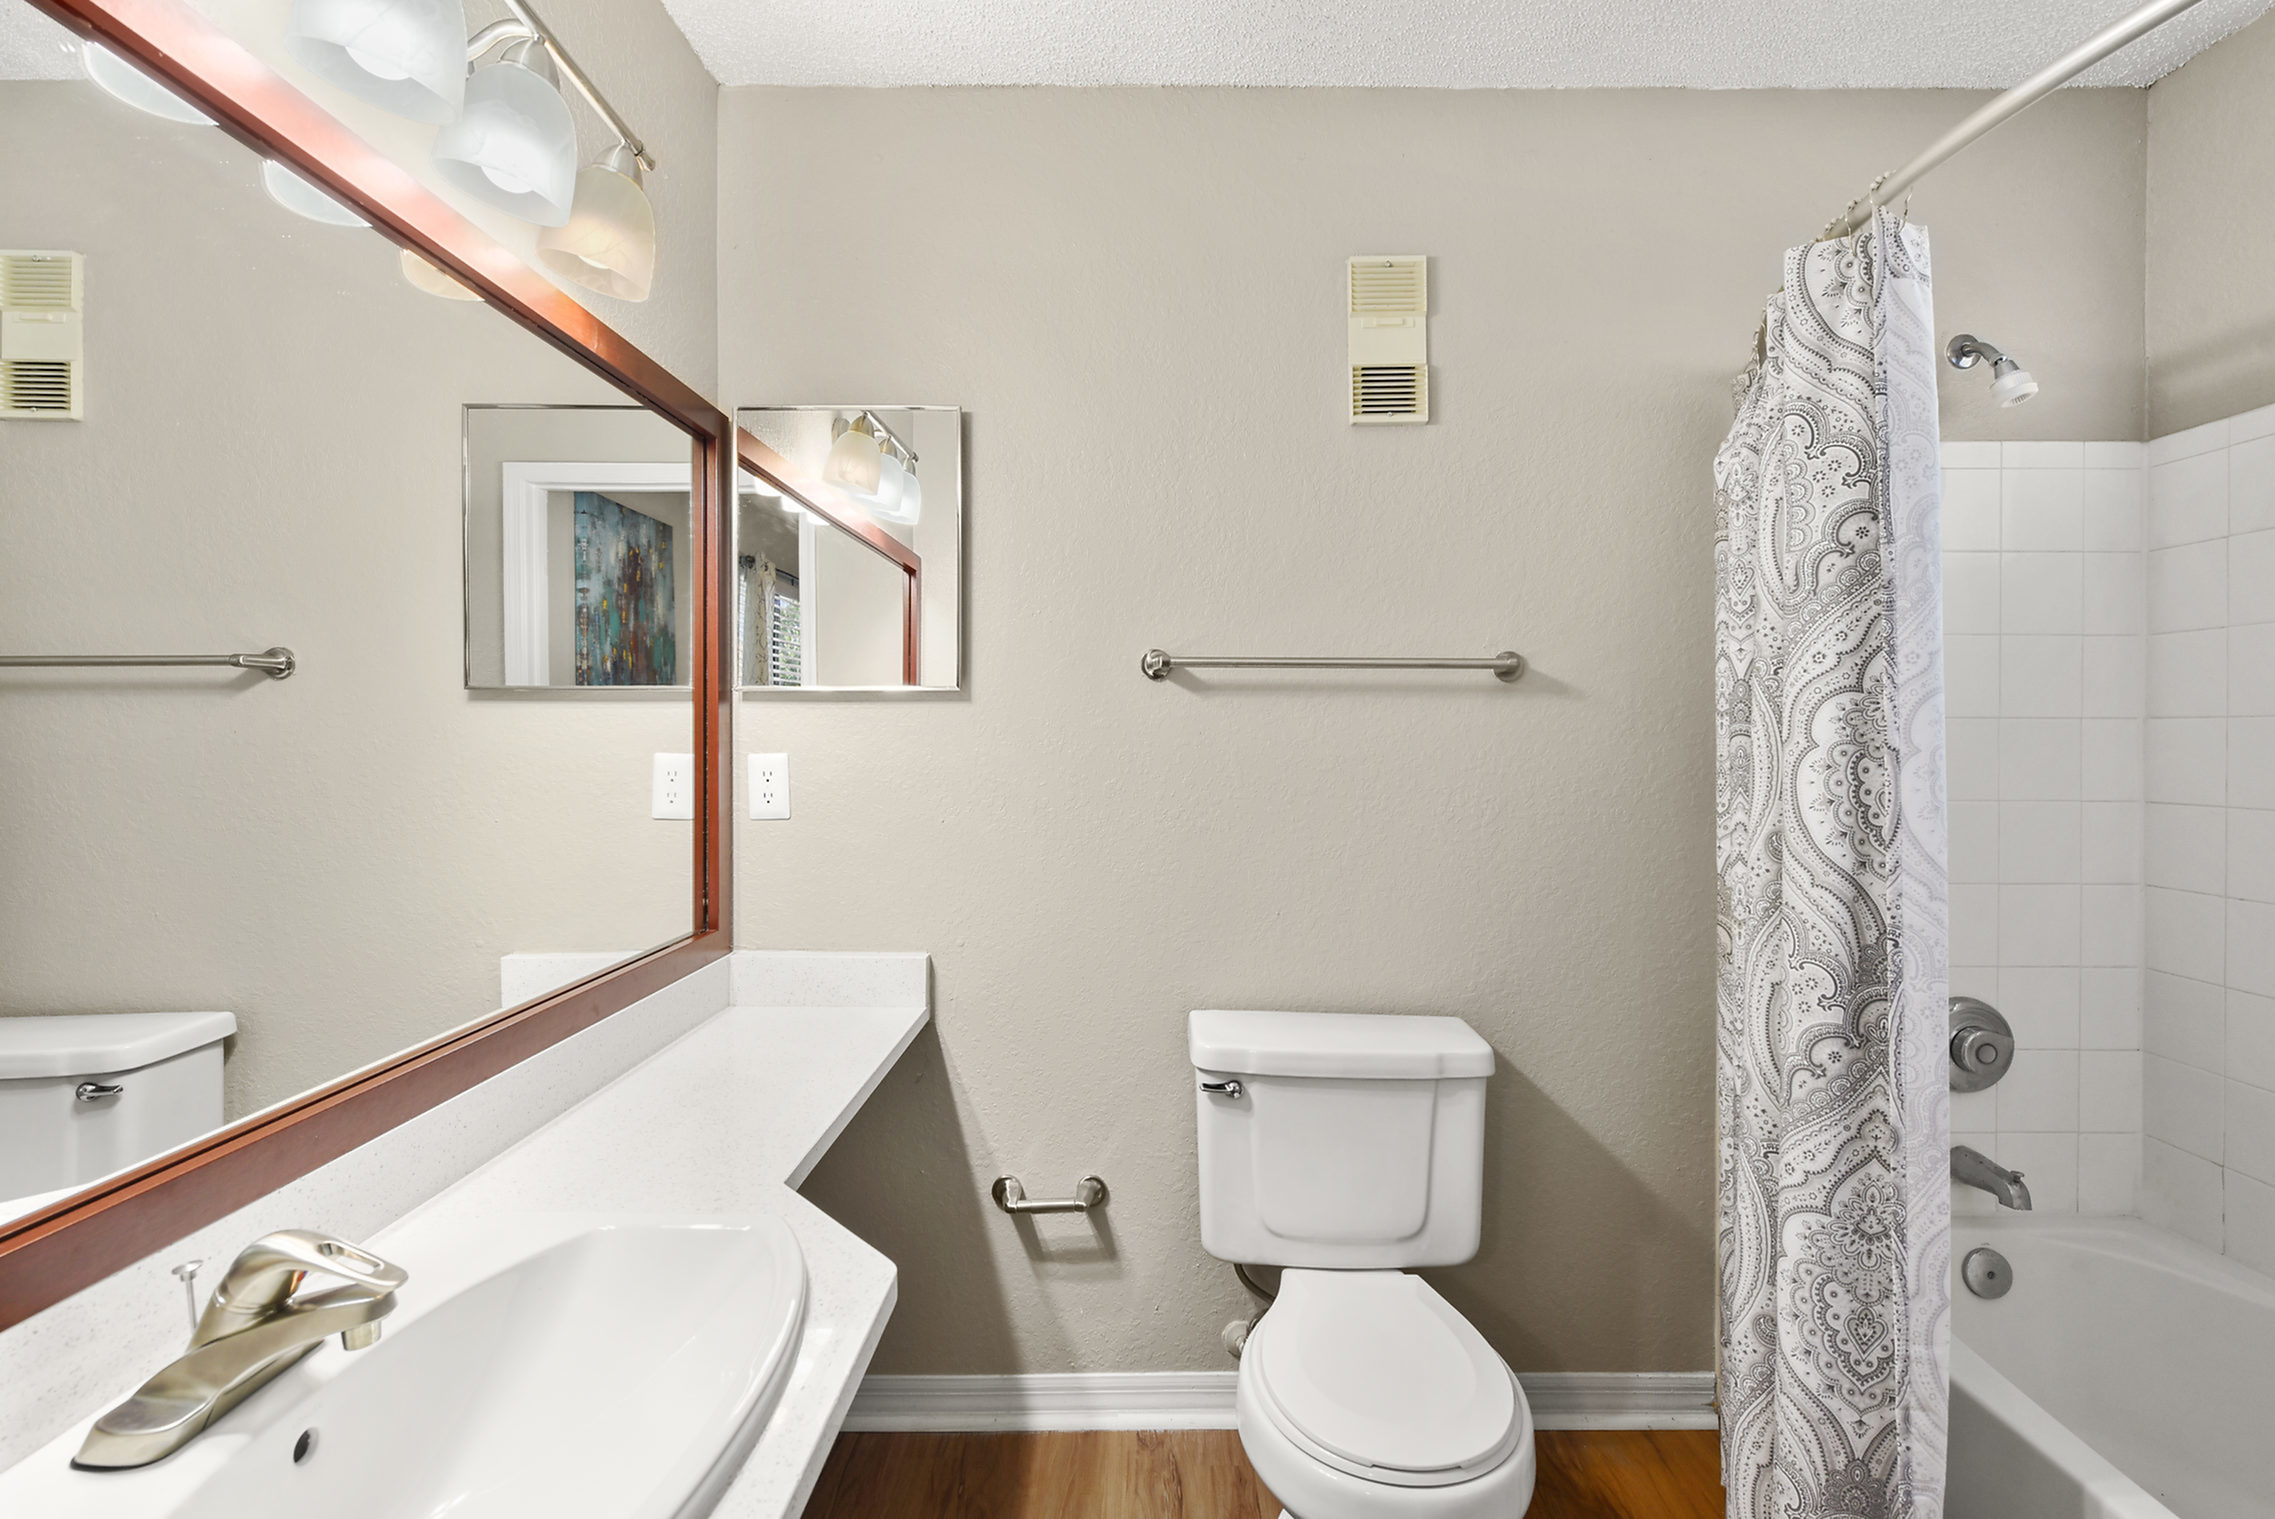 Image of Quartz Bathroom Countertops for Kernan Oaks